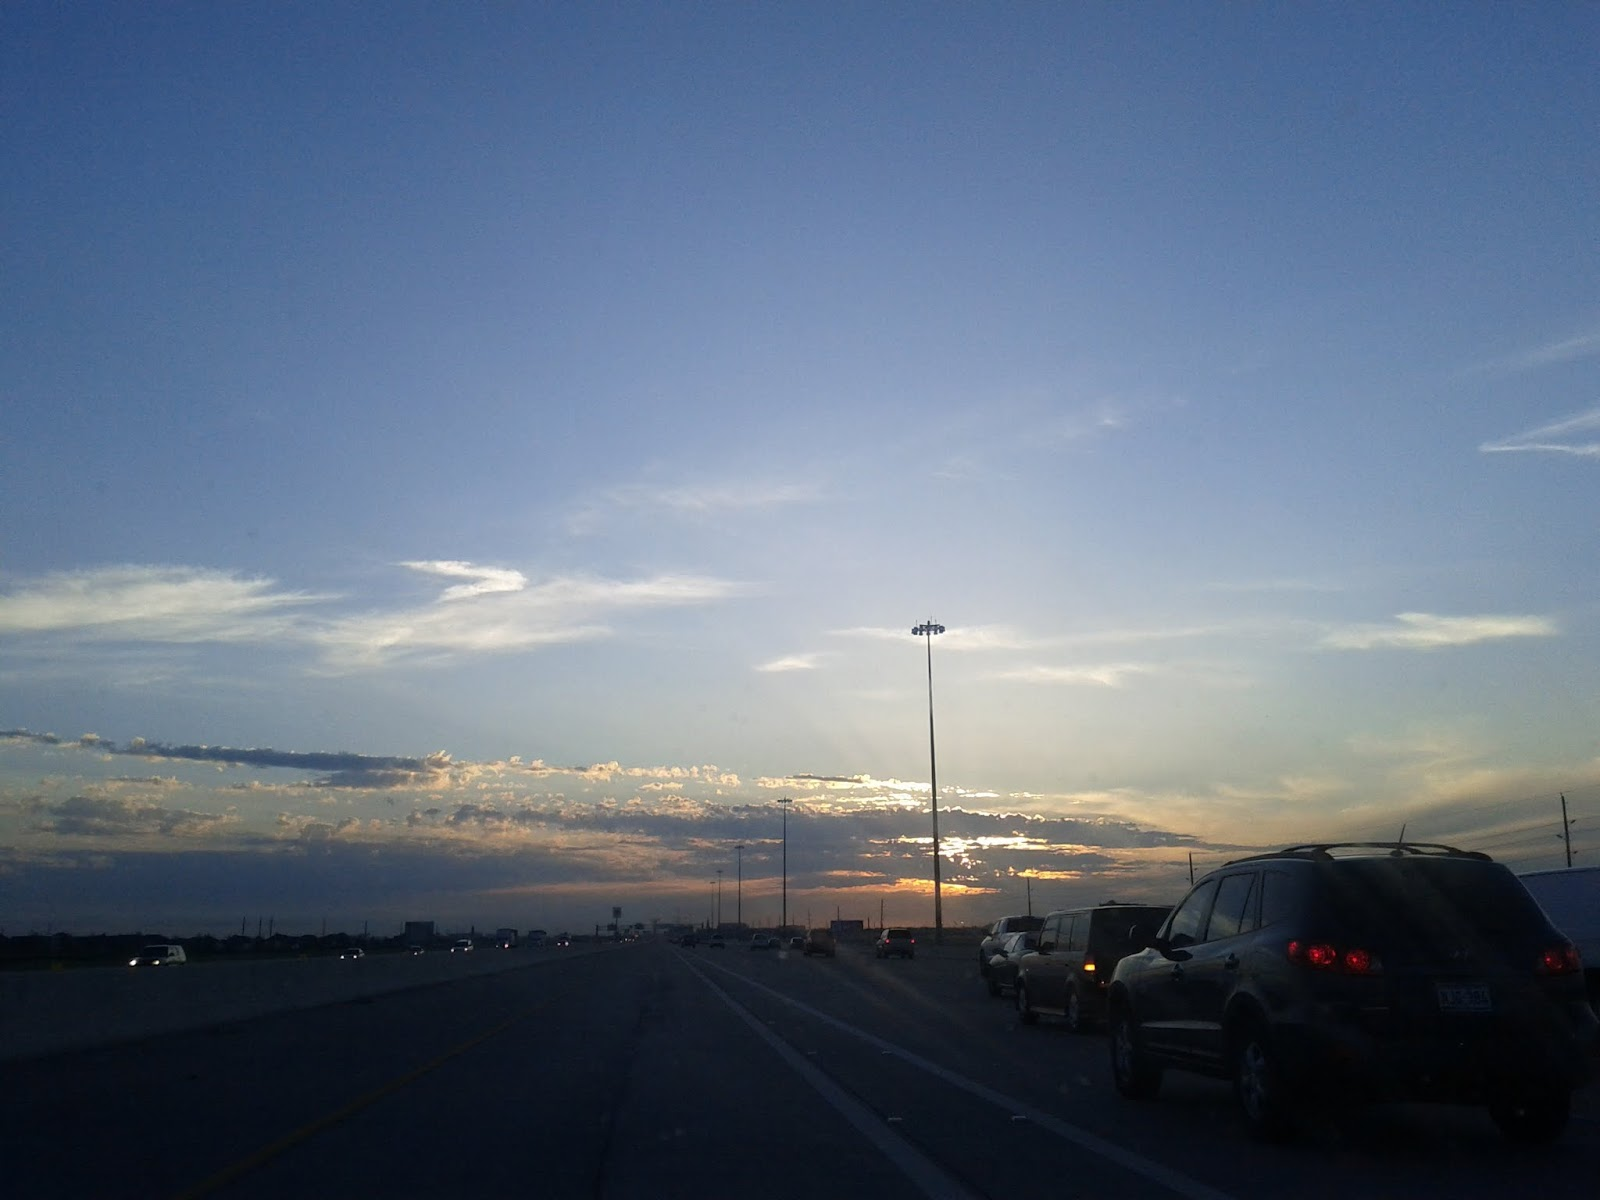 Sky - IMG_20110708_064331.jpg